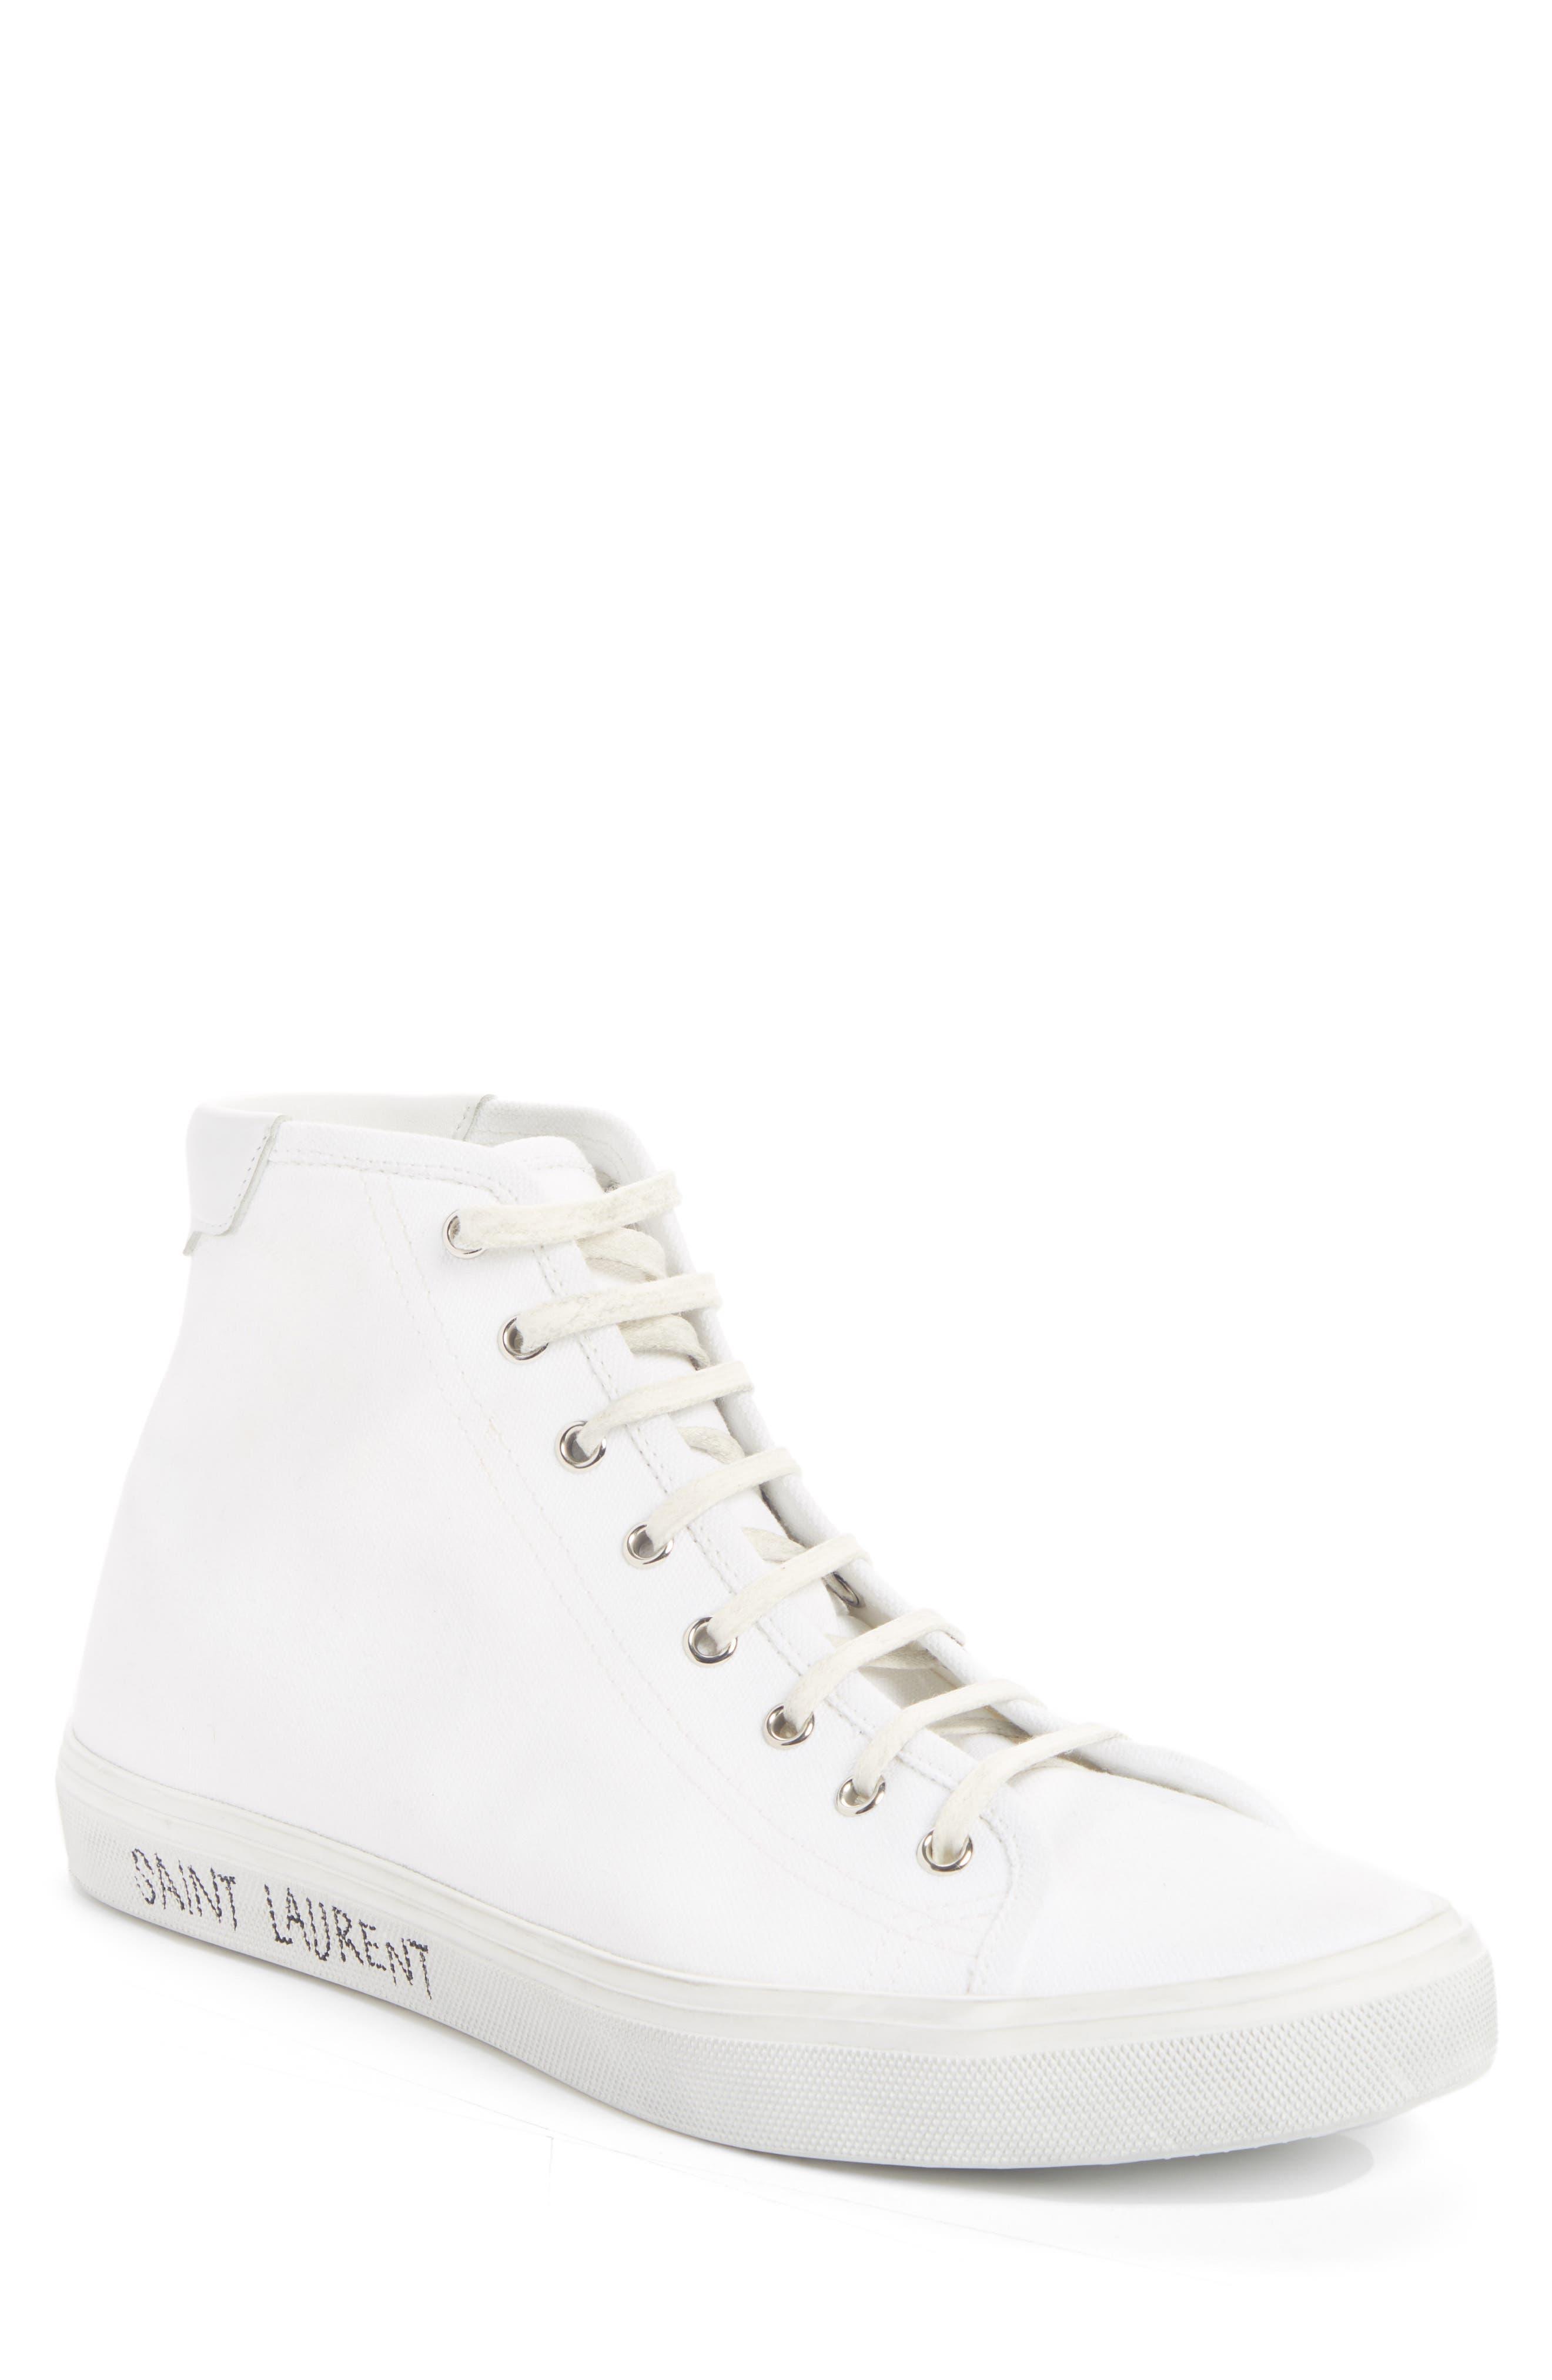 Saint Laurent Malibu Sneaker (Men